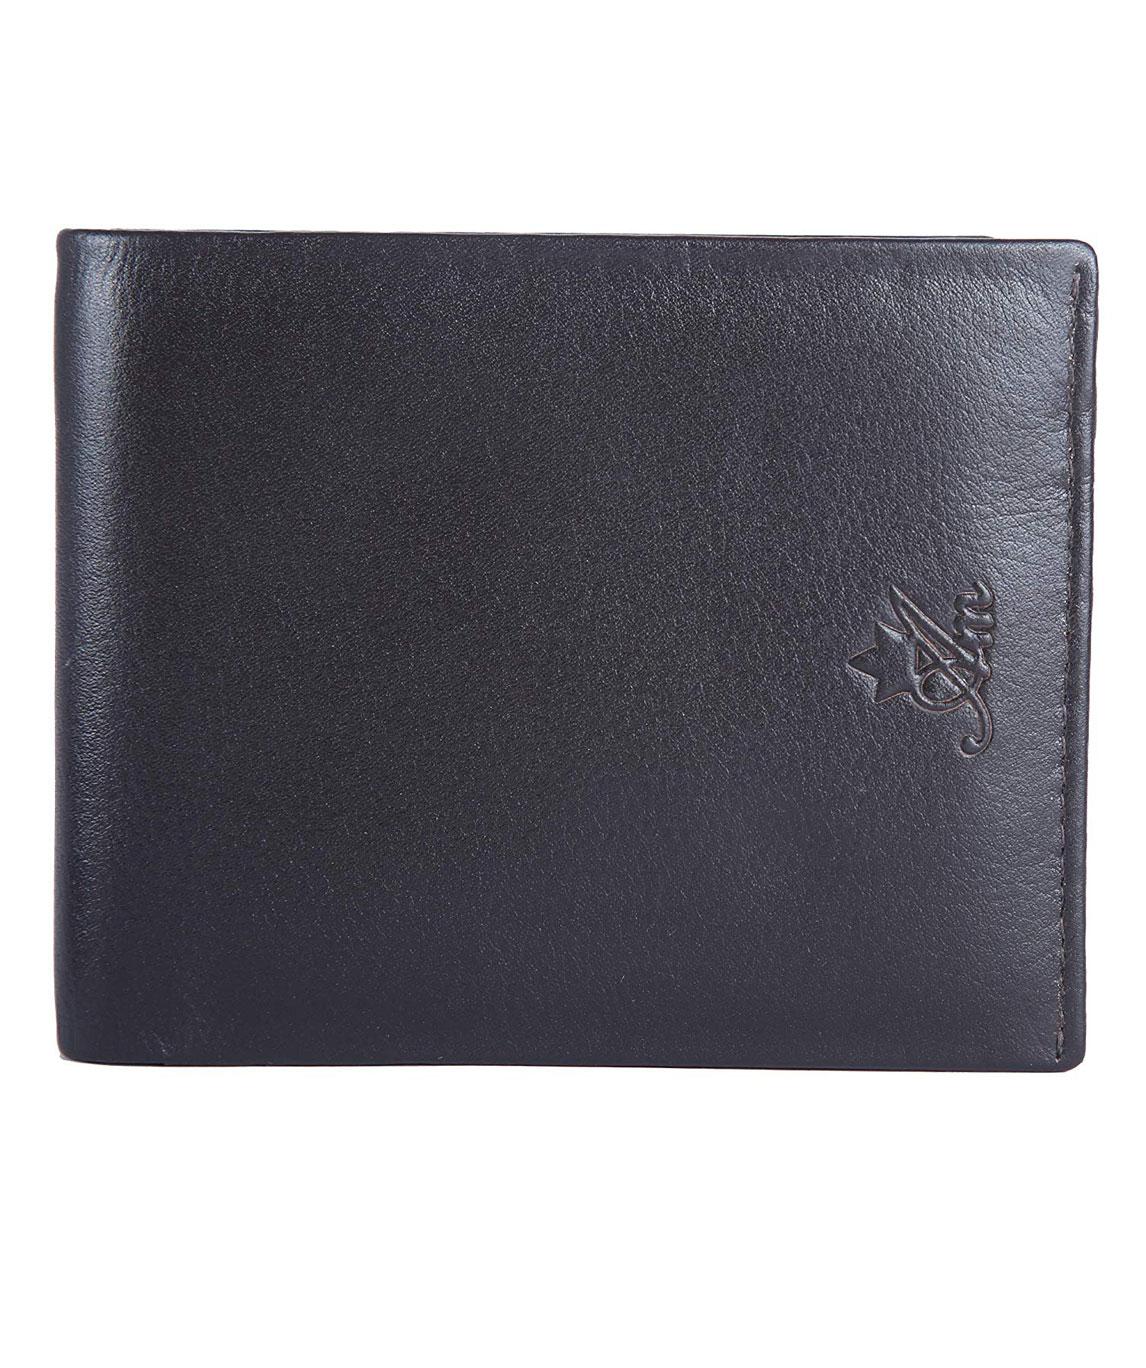 Am Leather Signature Style Italian Premium Leather Men Wallet (Navy Blue)